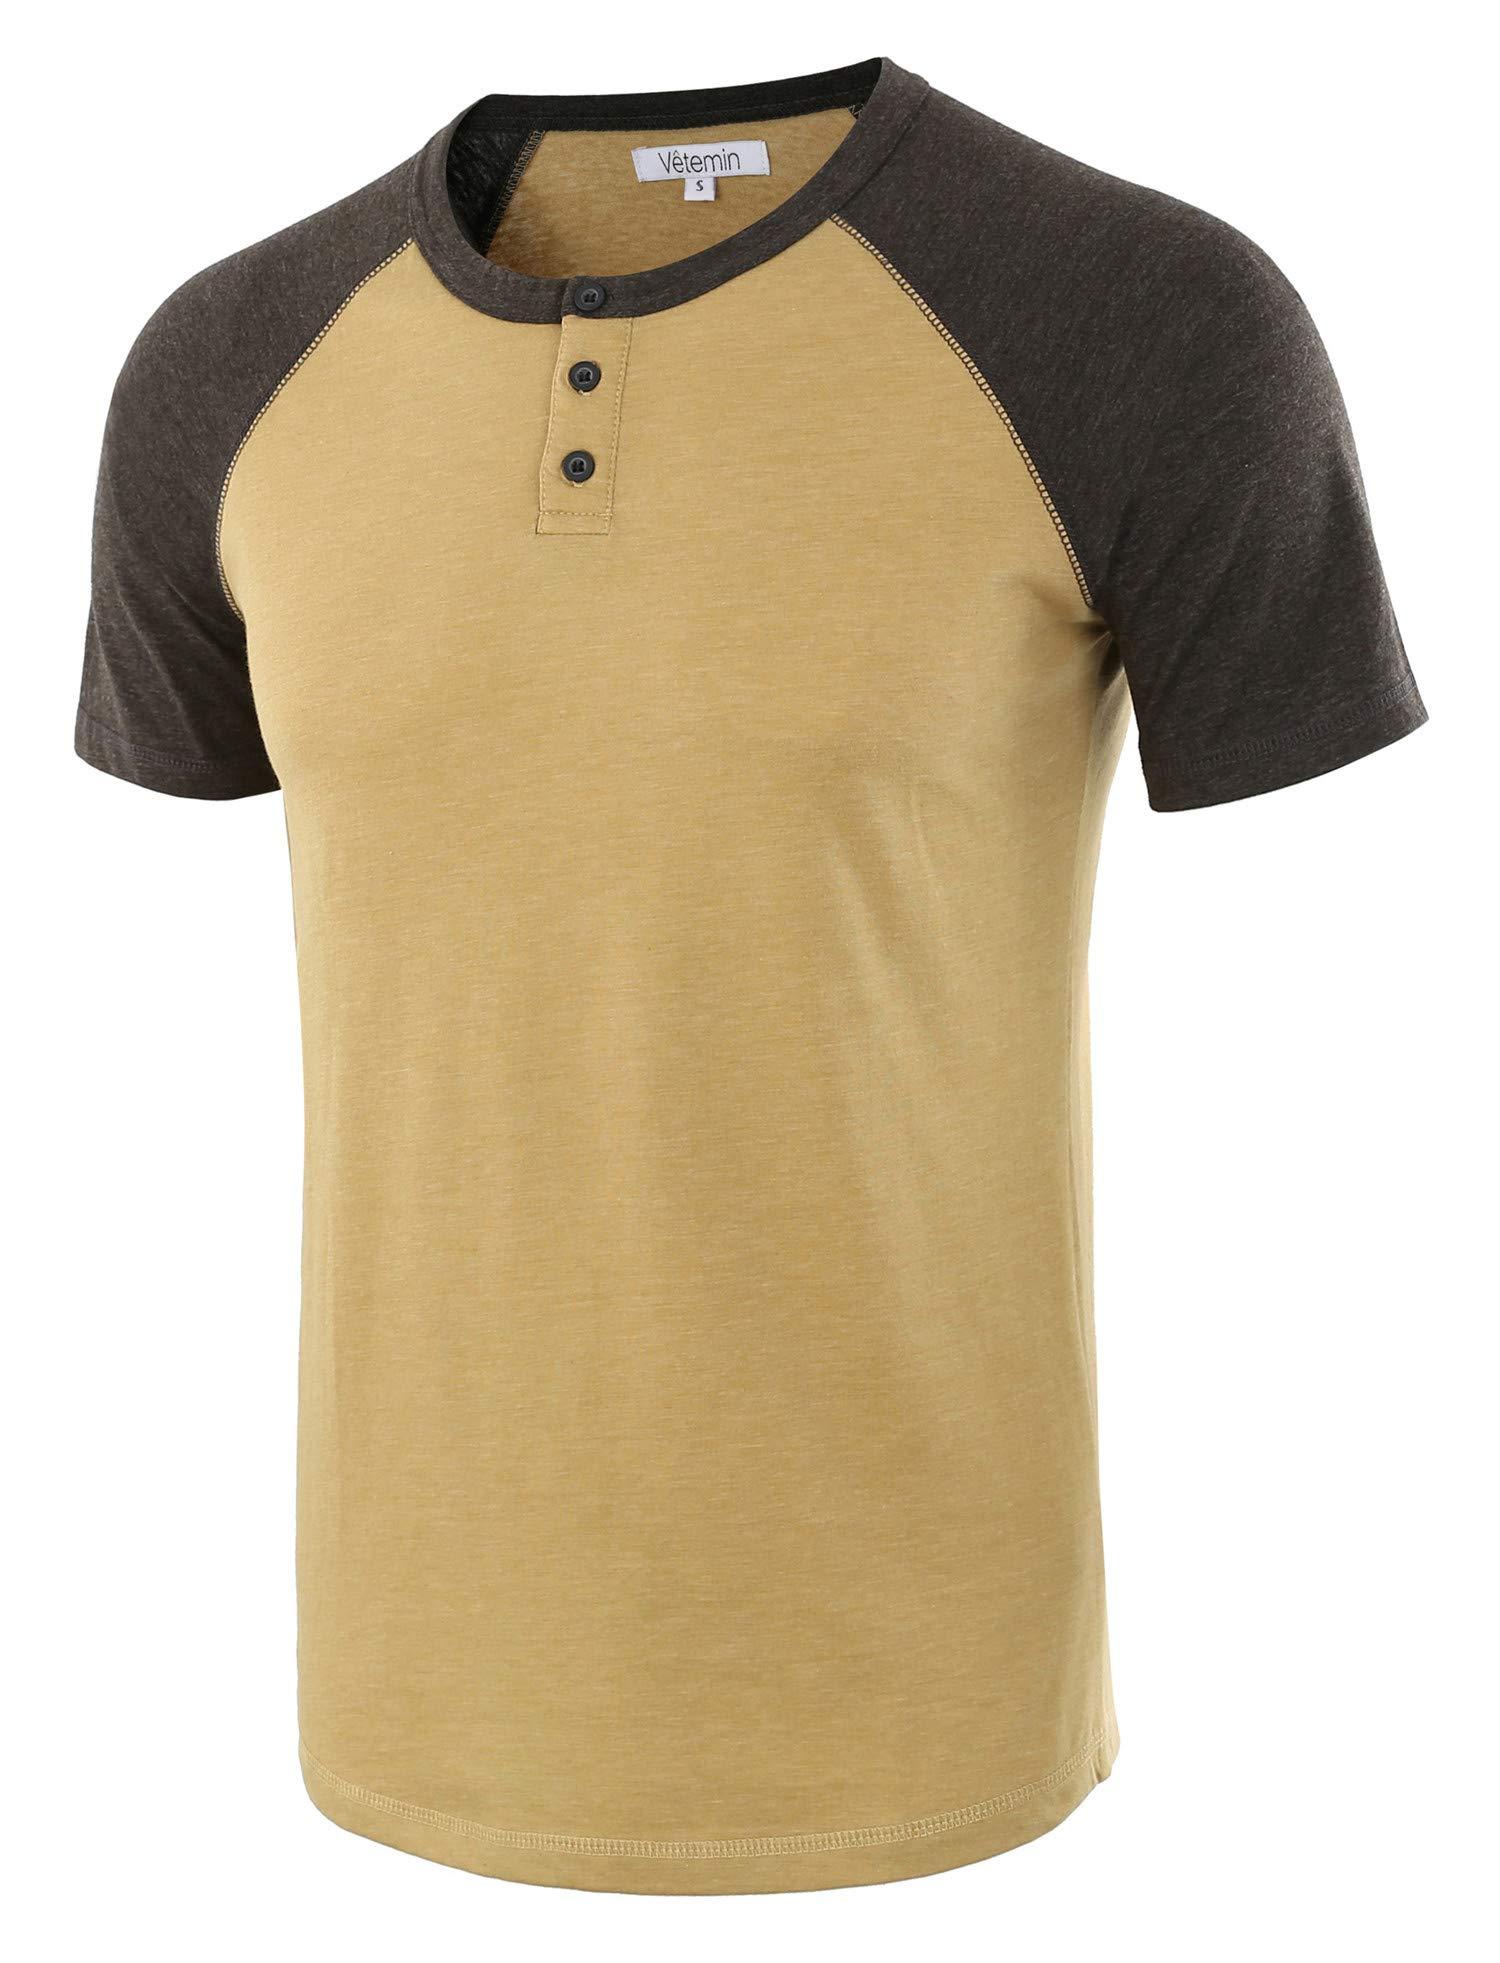 Vetemin Men's Casual Short Sleeve Raglan Henley T-Shirts Baseball Shirts Tee Khaki/H.Charcoal XL